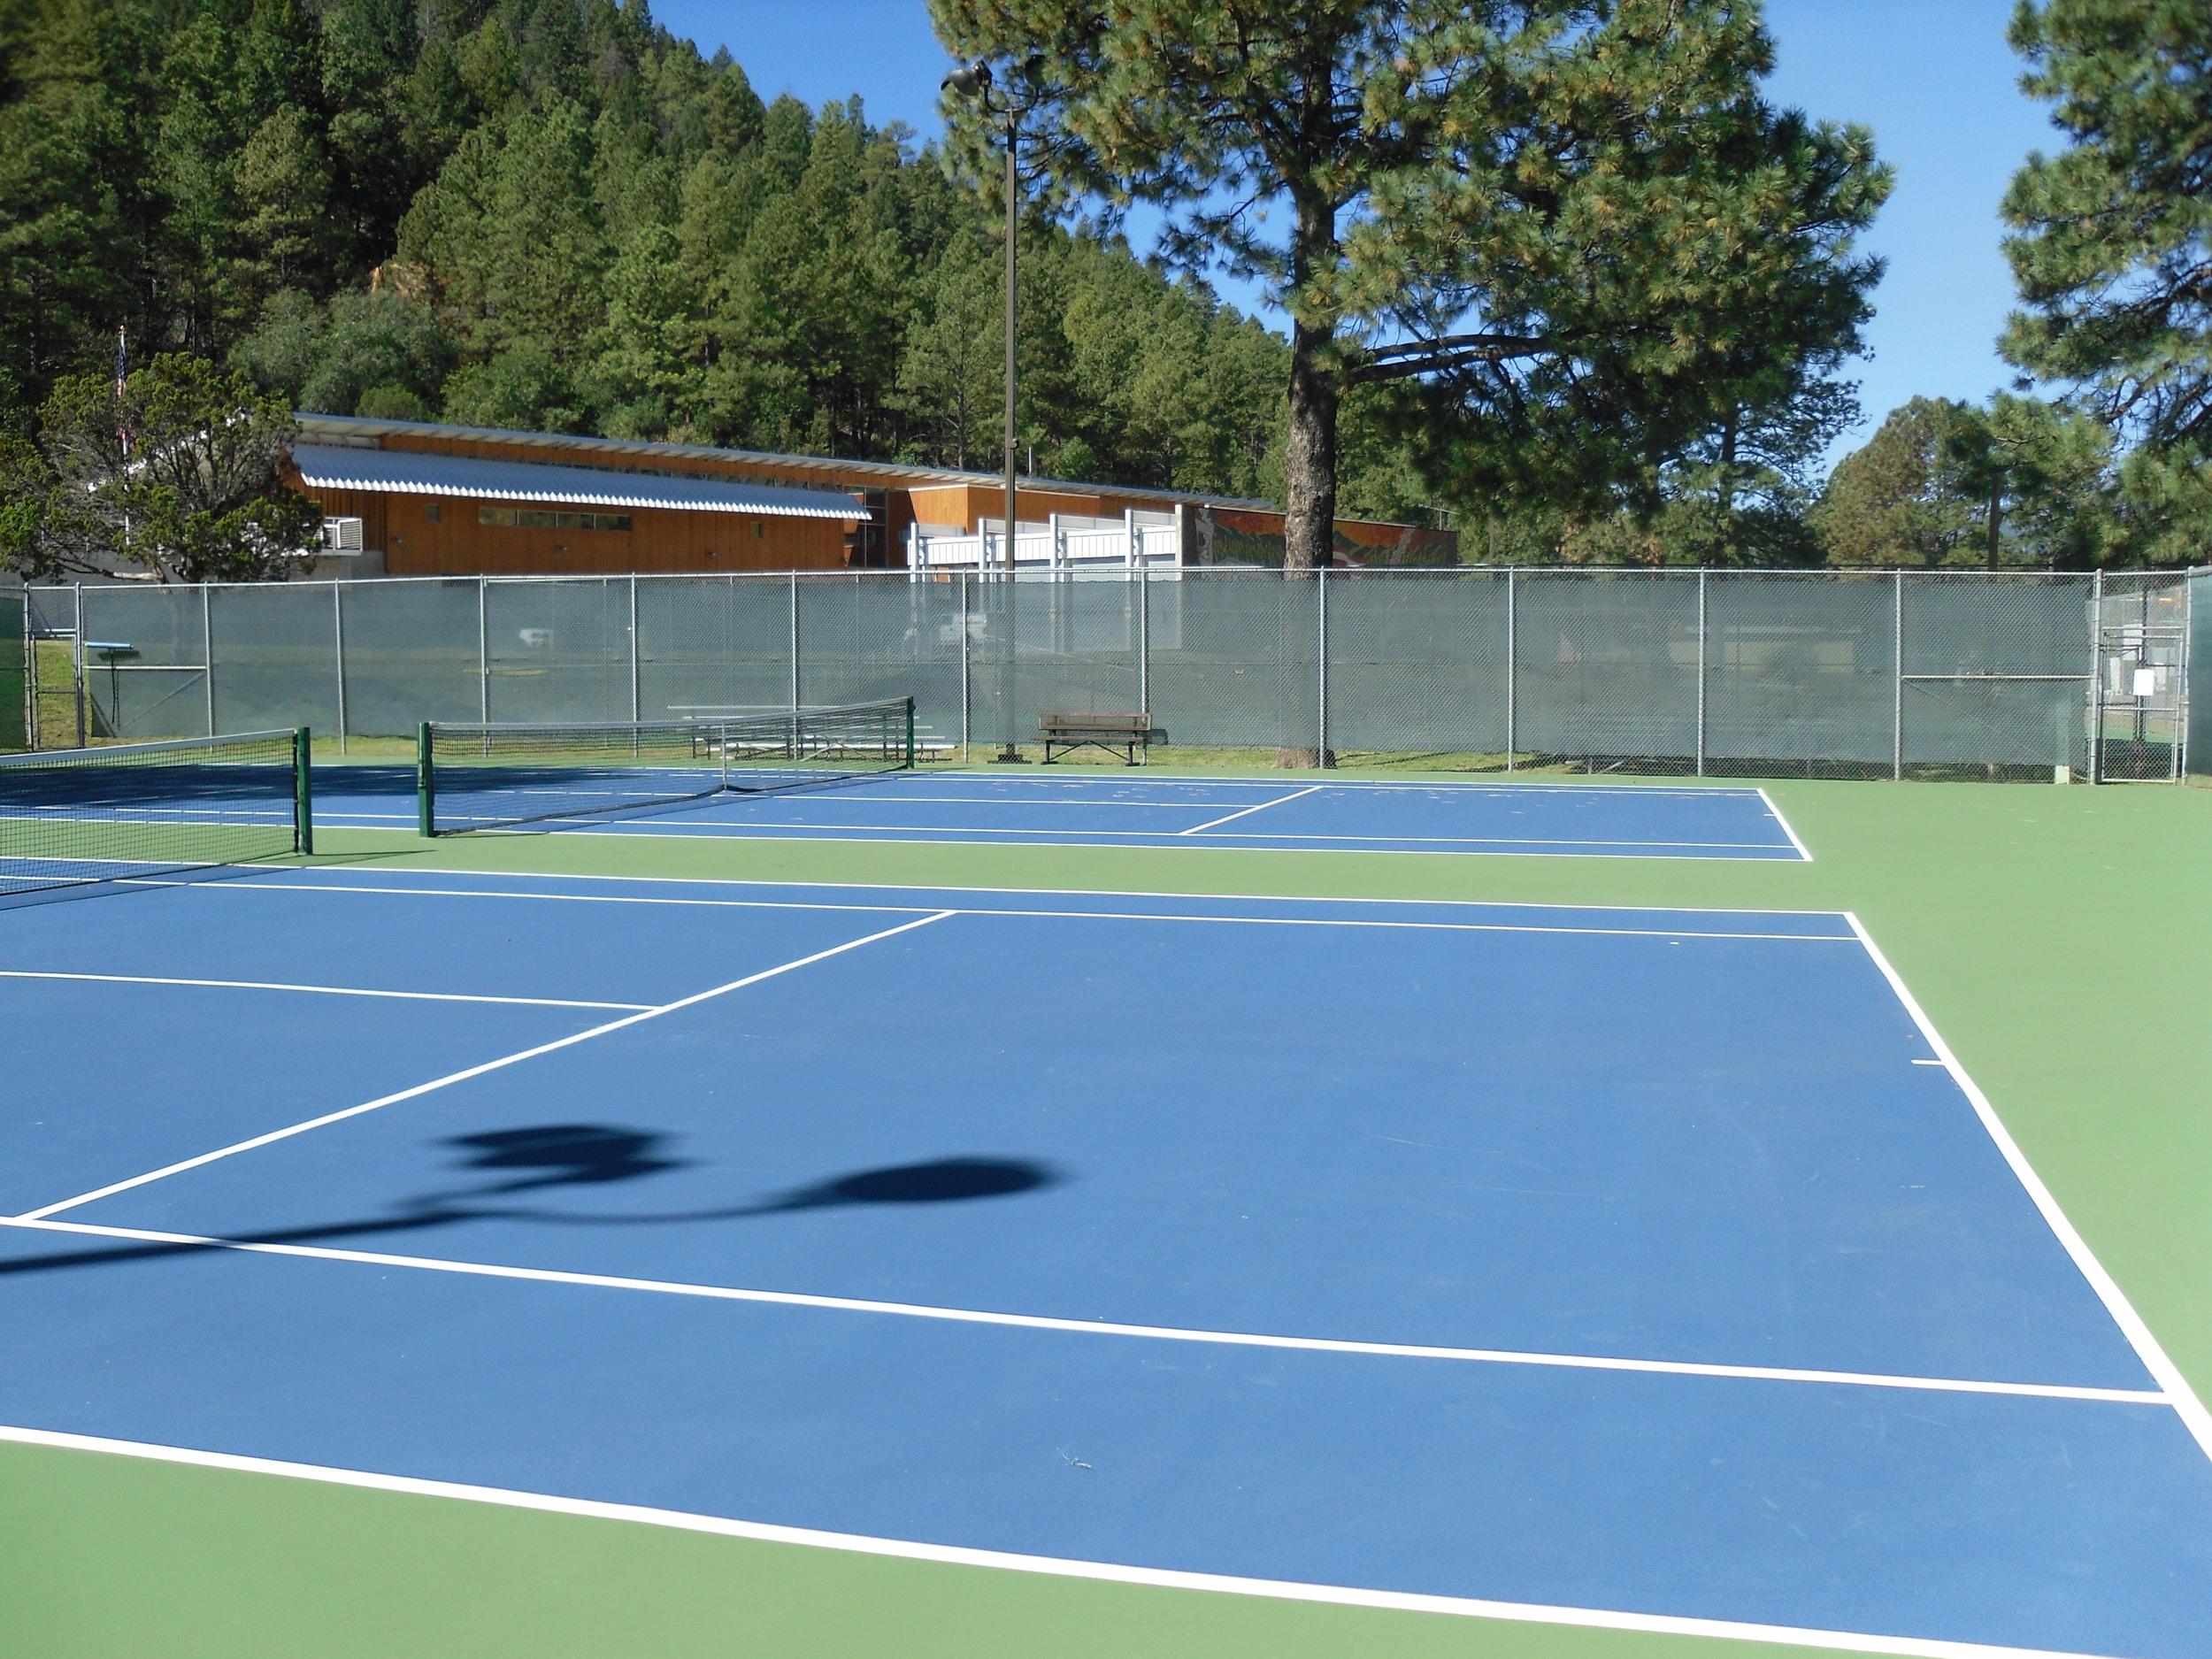 shp tennis courts.jpg